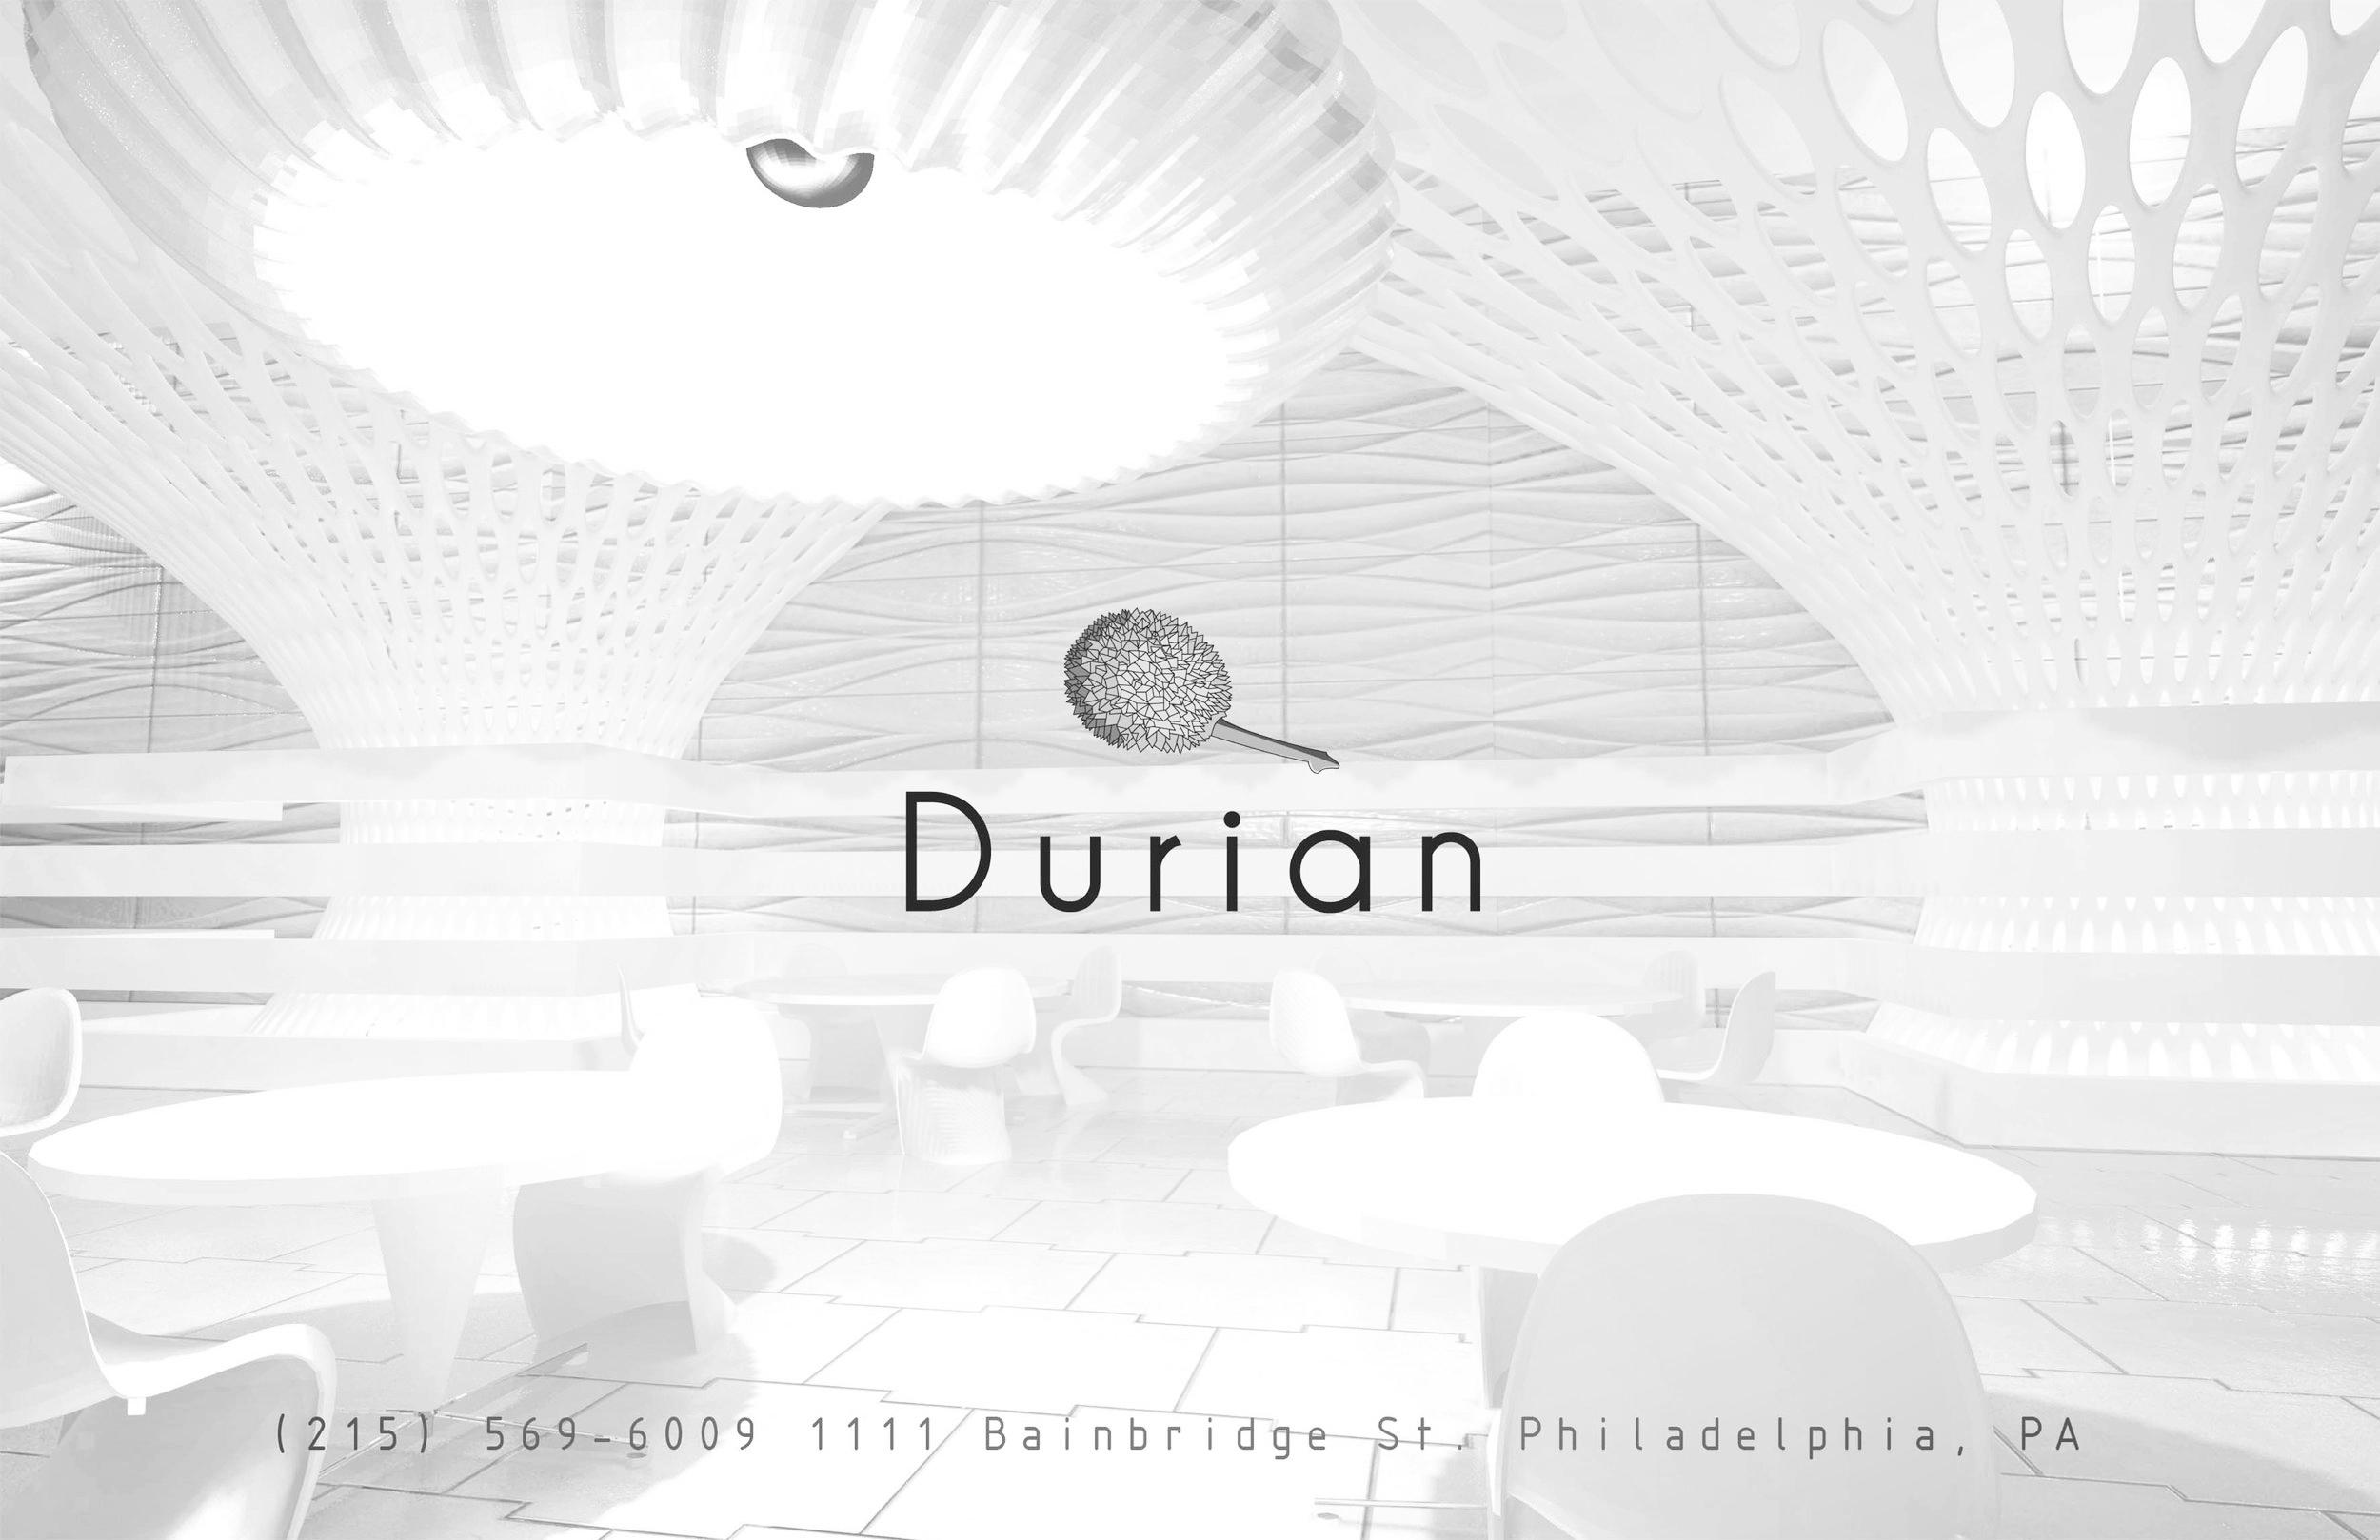 Durian restaurant - Branding Strategy.More..